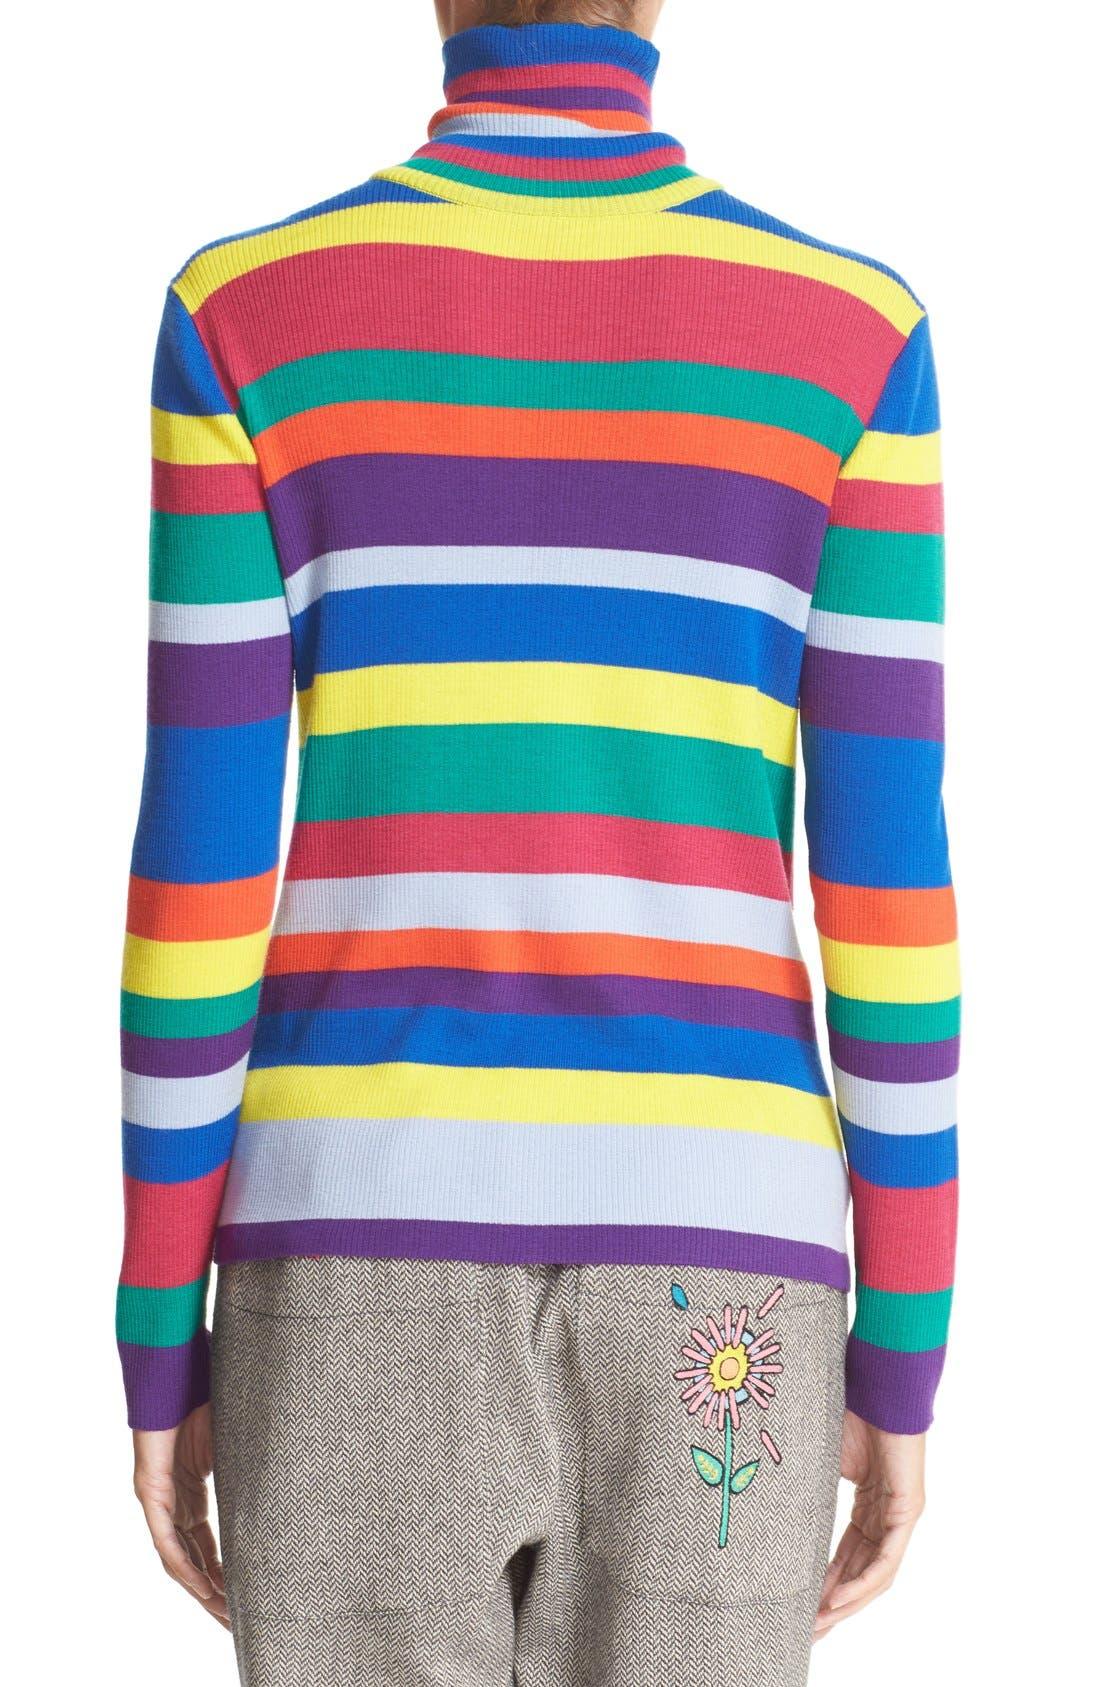 Stripe Merino Wool Turtleneck,                             Alternate thumbnail 5, color,                             960